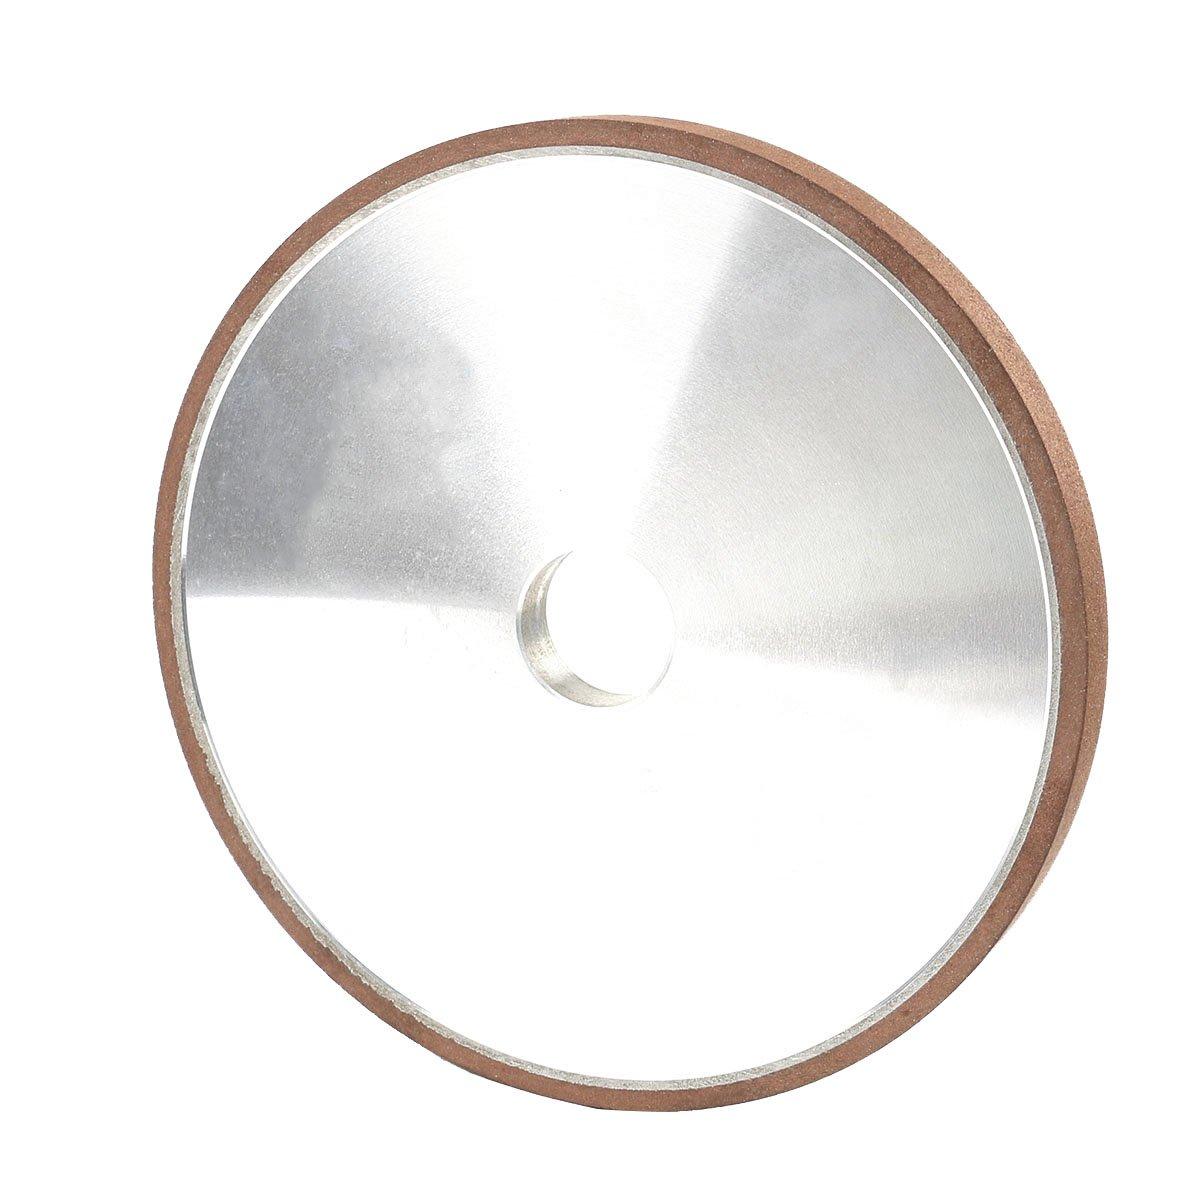 Kuntemu 1PC Diamond Grinding Wheel Grinding Disc Saw Blade Mill Sharpening Grinding Wheel Rotary Abrasive Tools